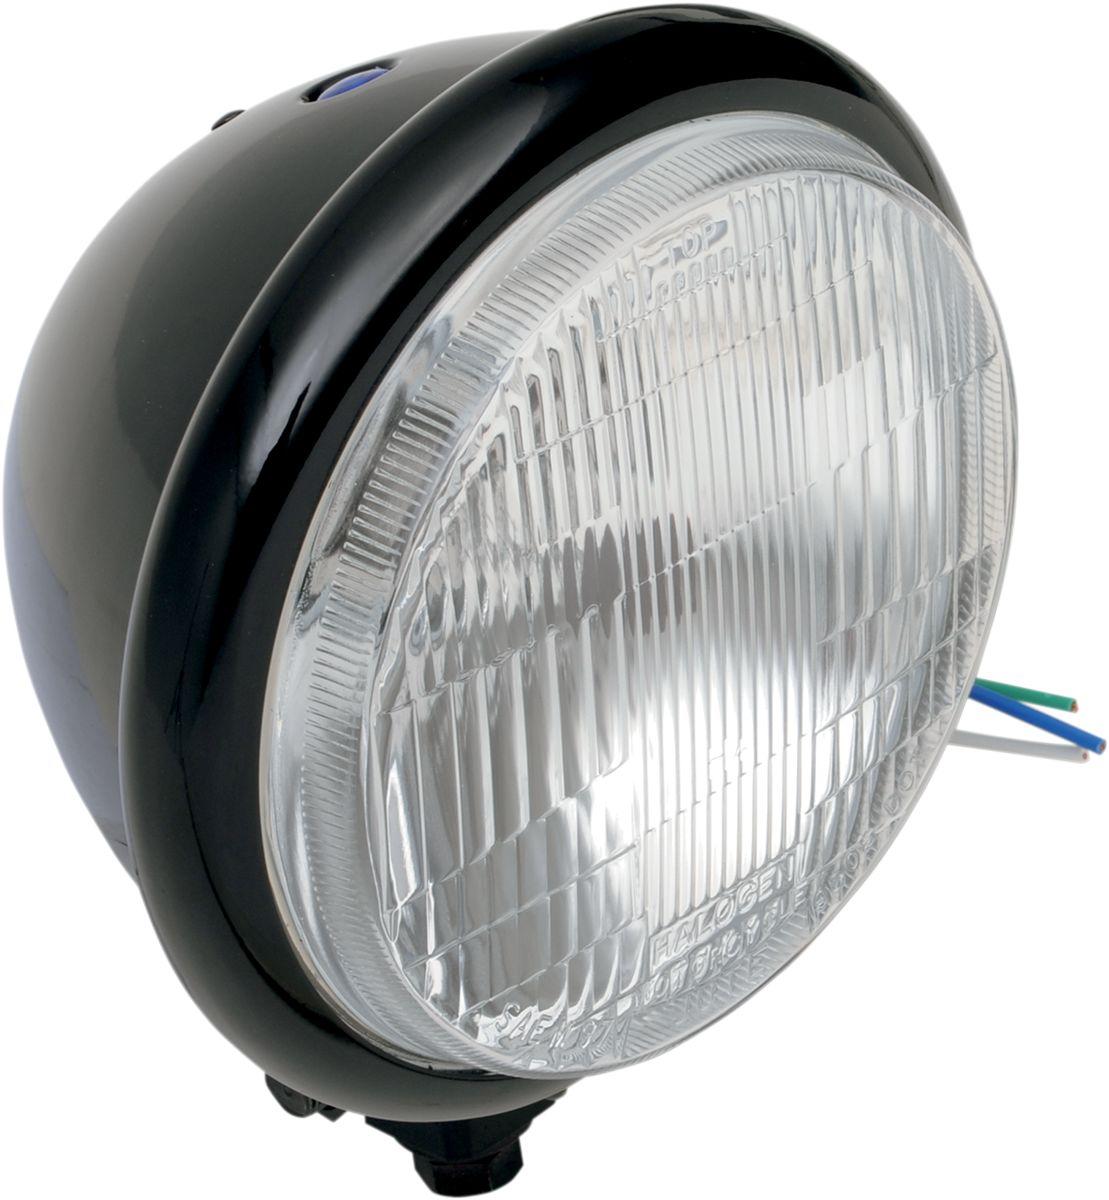 "【Drag Specialties】頭燈/ 5.75"" 黑色 【HEADLIGHT 5.75"" BLK [2001-0553]】 - 「Webike-摩托百貨」"